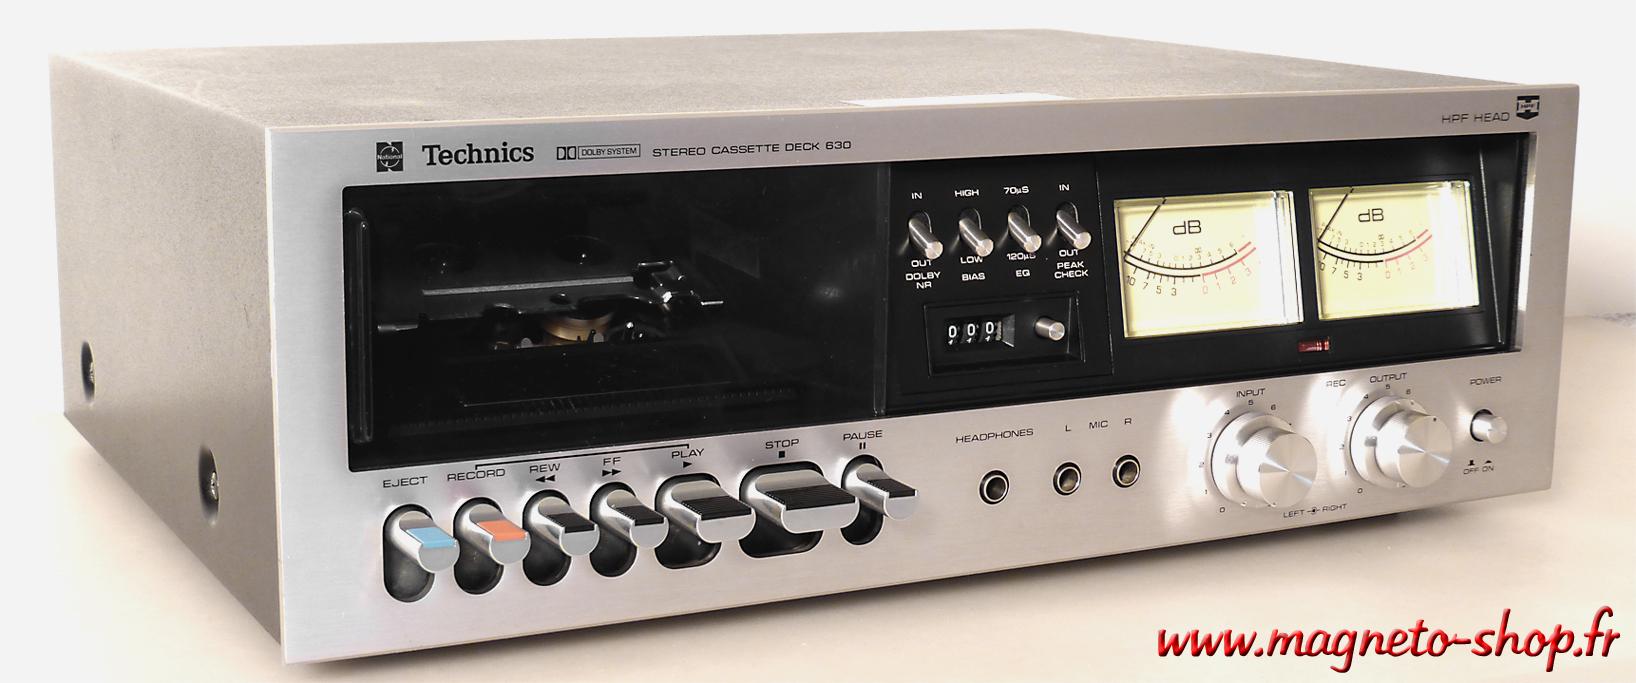 TECHNICS RS-630 AUS